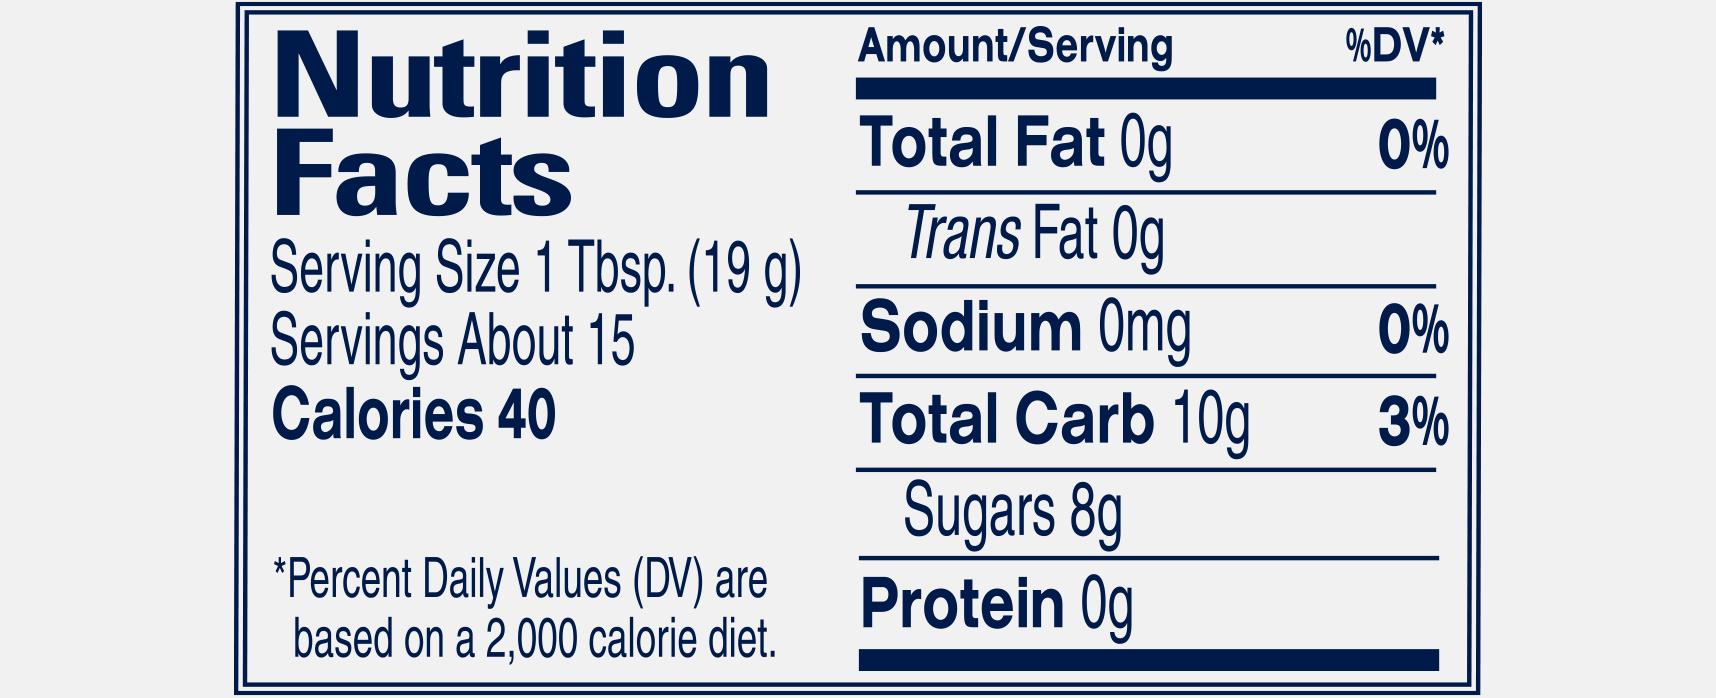 StDalfour_NutritionFacts_Blackberry.png